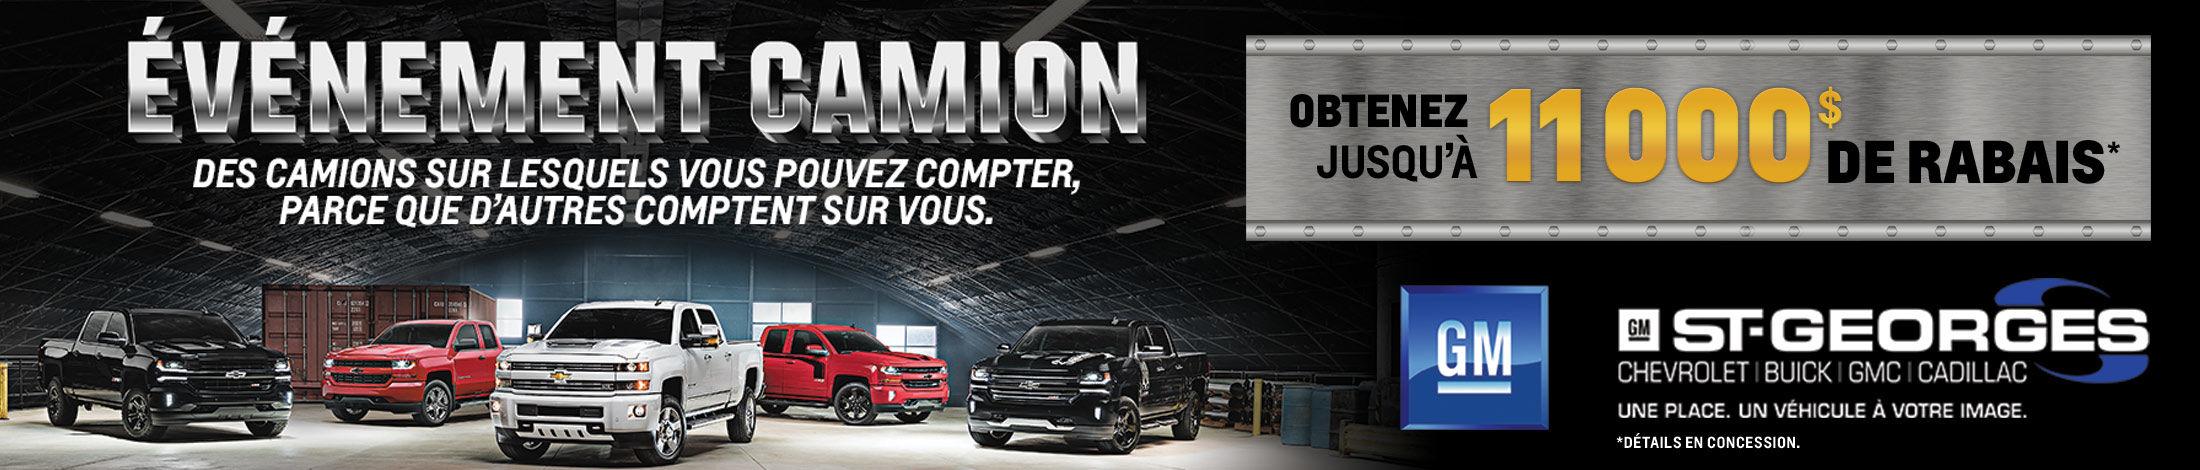 Promo GM Mars